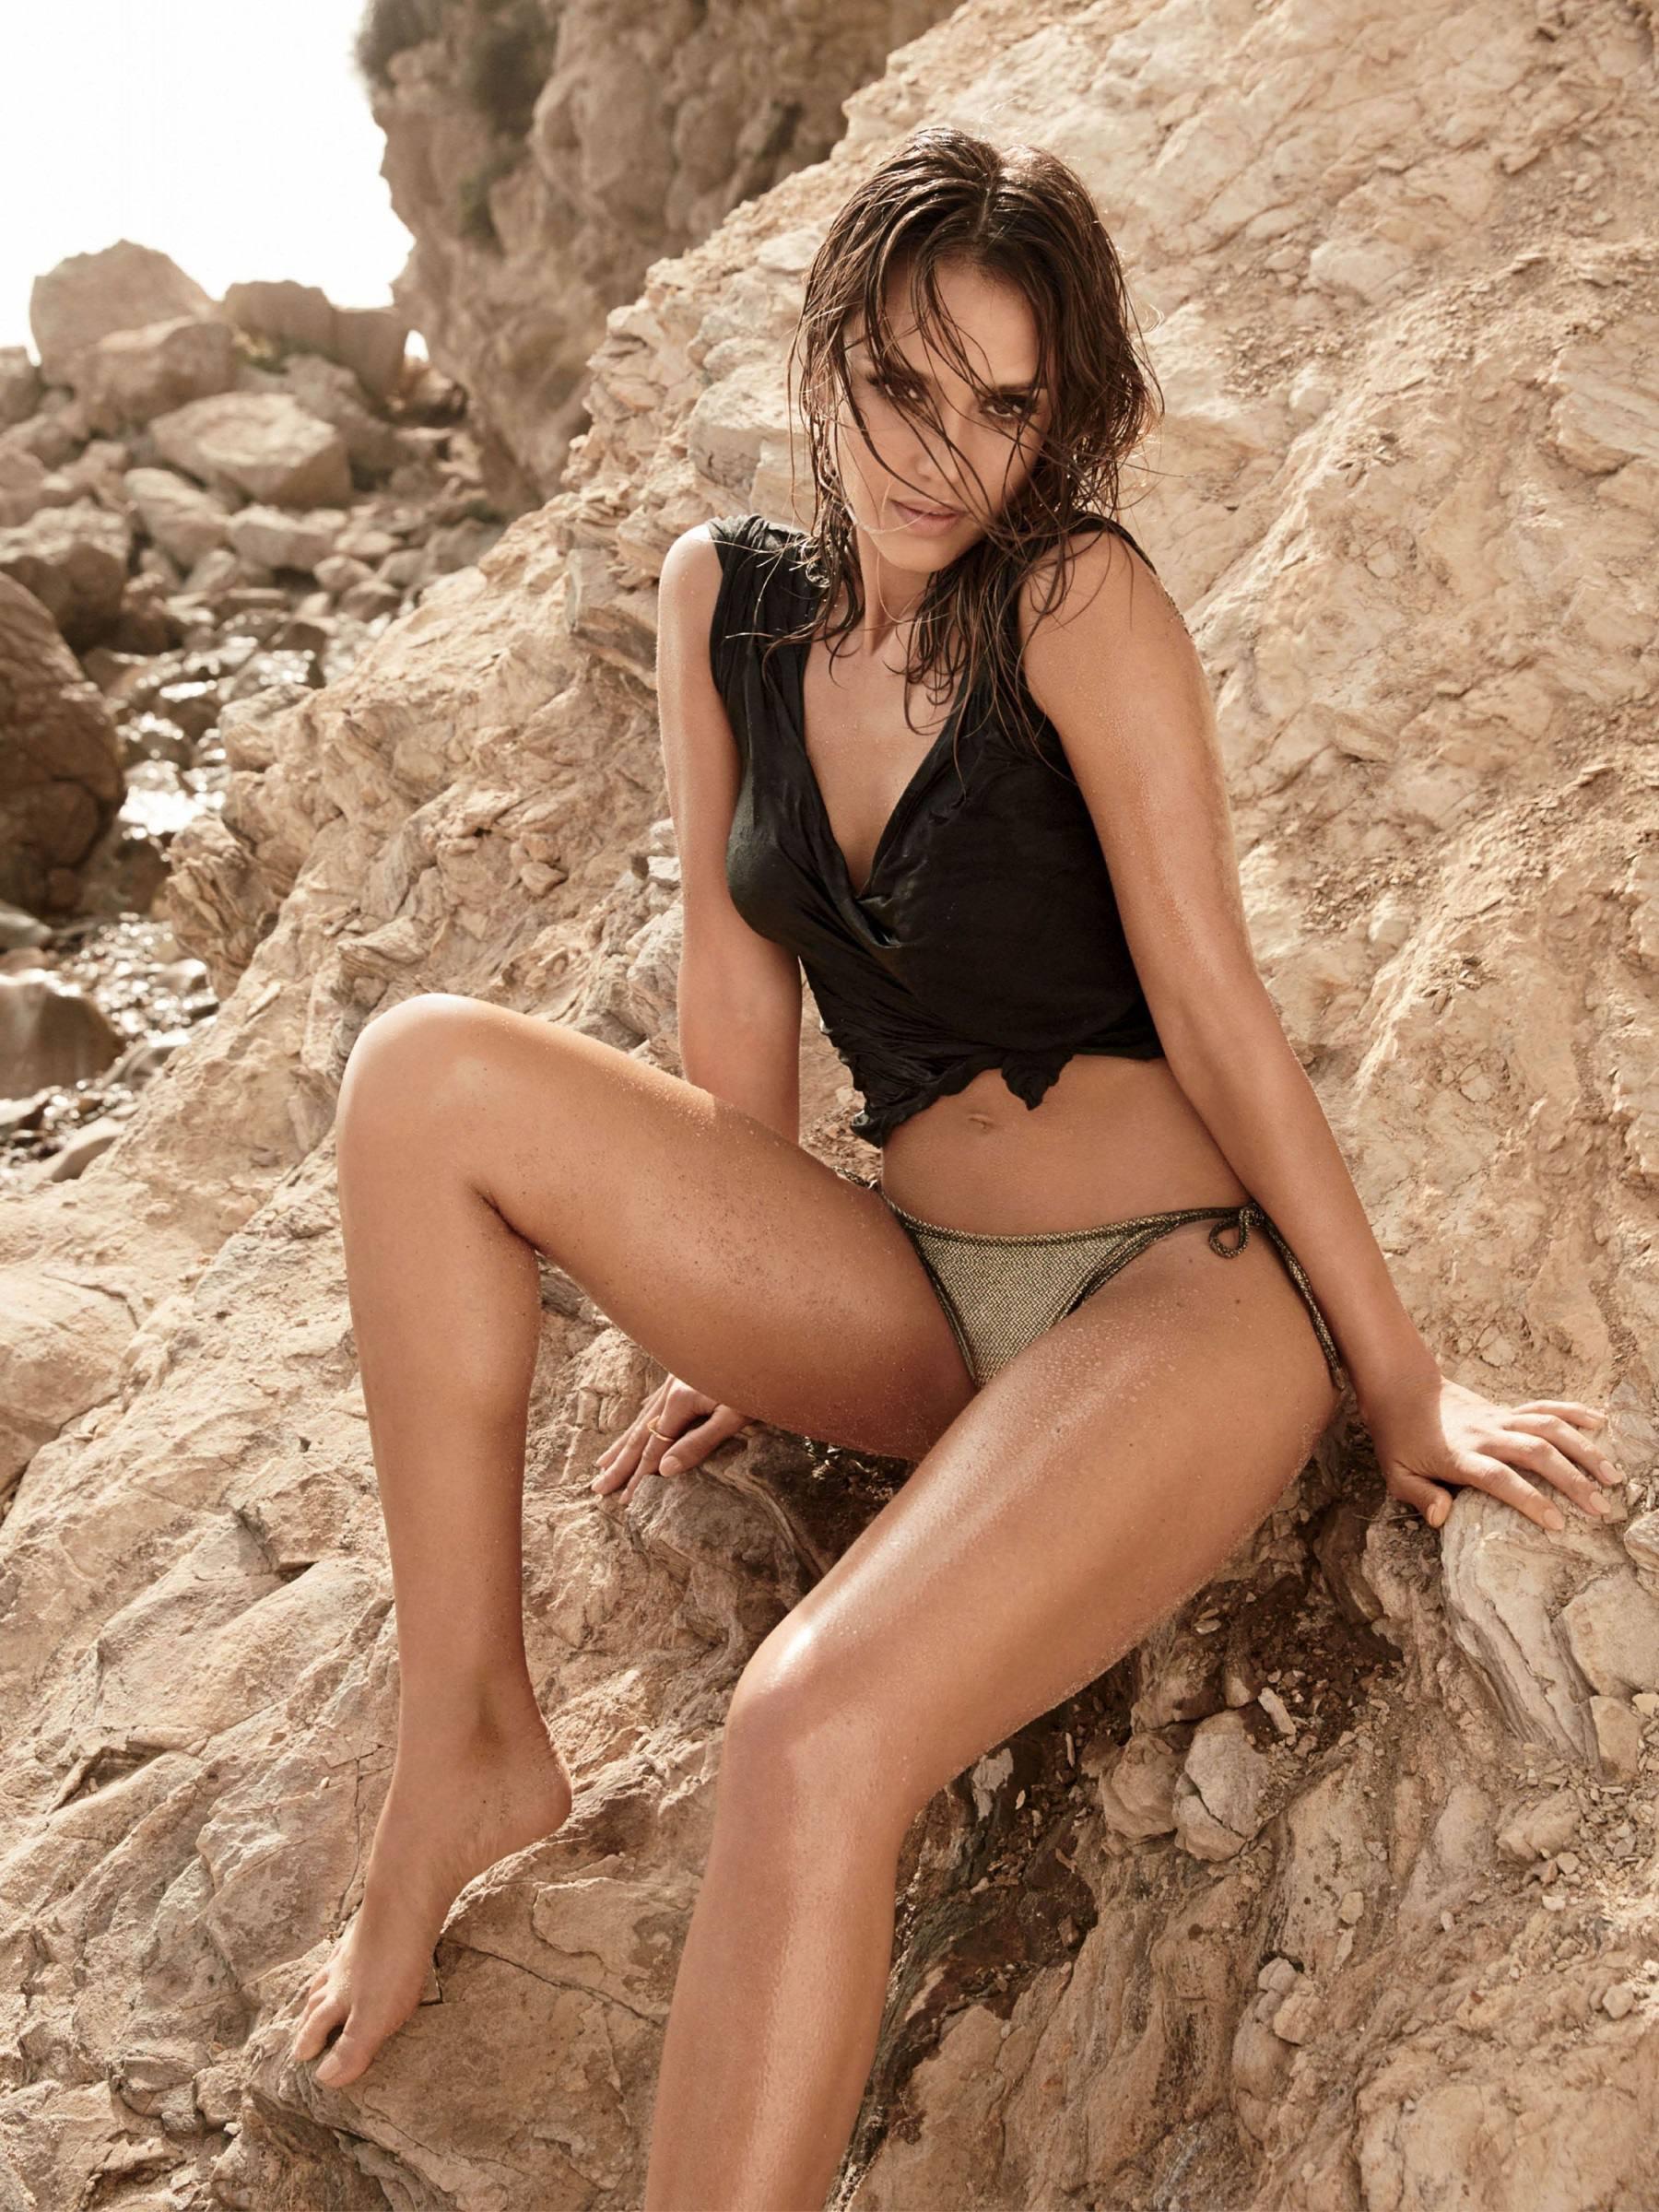 Jessica Alba – Beautiful Body In Sexy Photoshoot For Maxim Magazine (september 2014) (hq) 0003